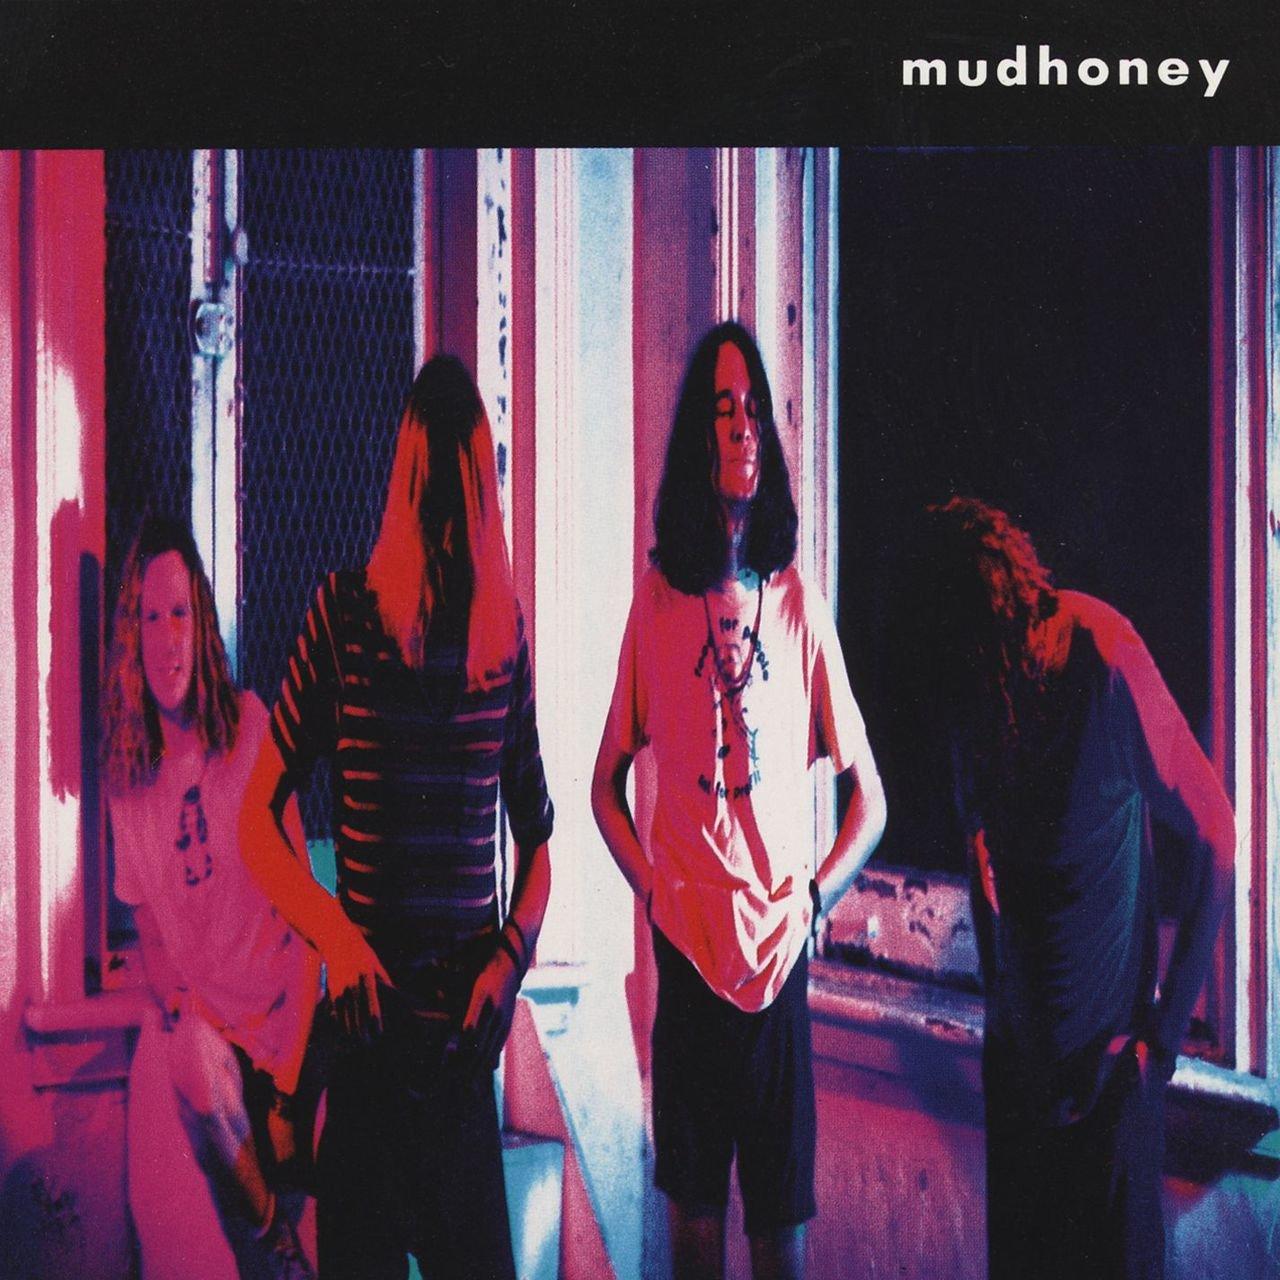 Mudhoney - Mudhoney [LTD LP] (Violet vinyl)